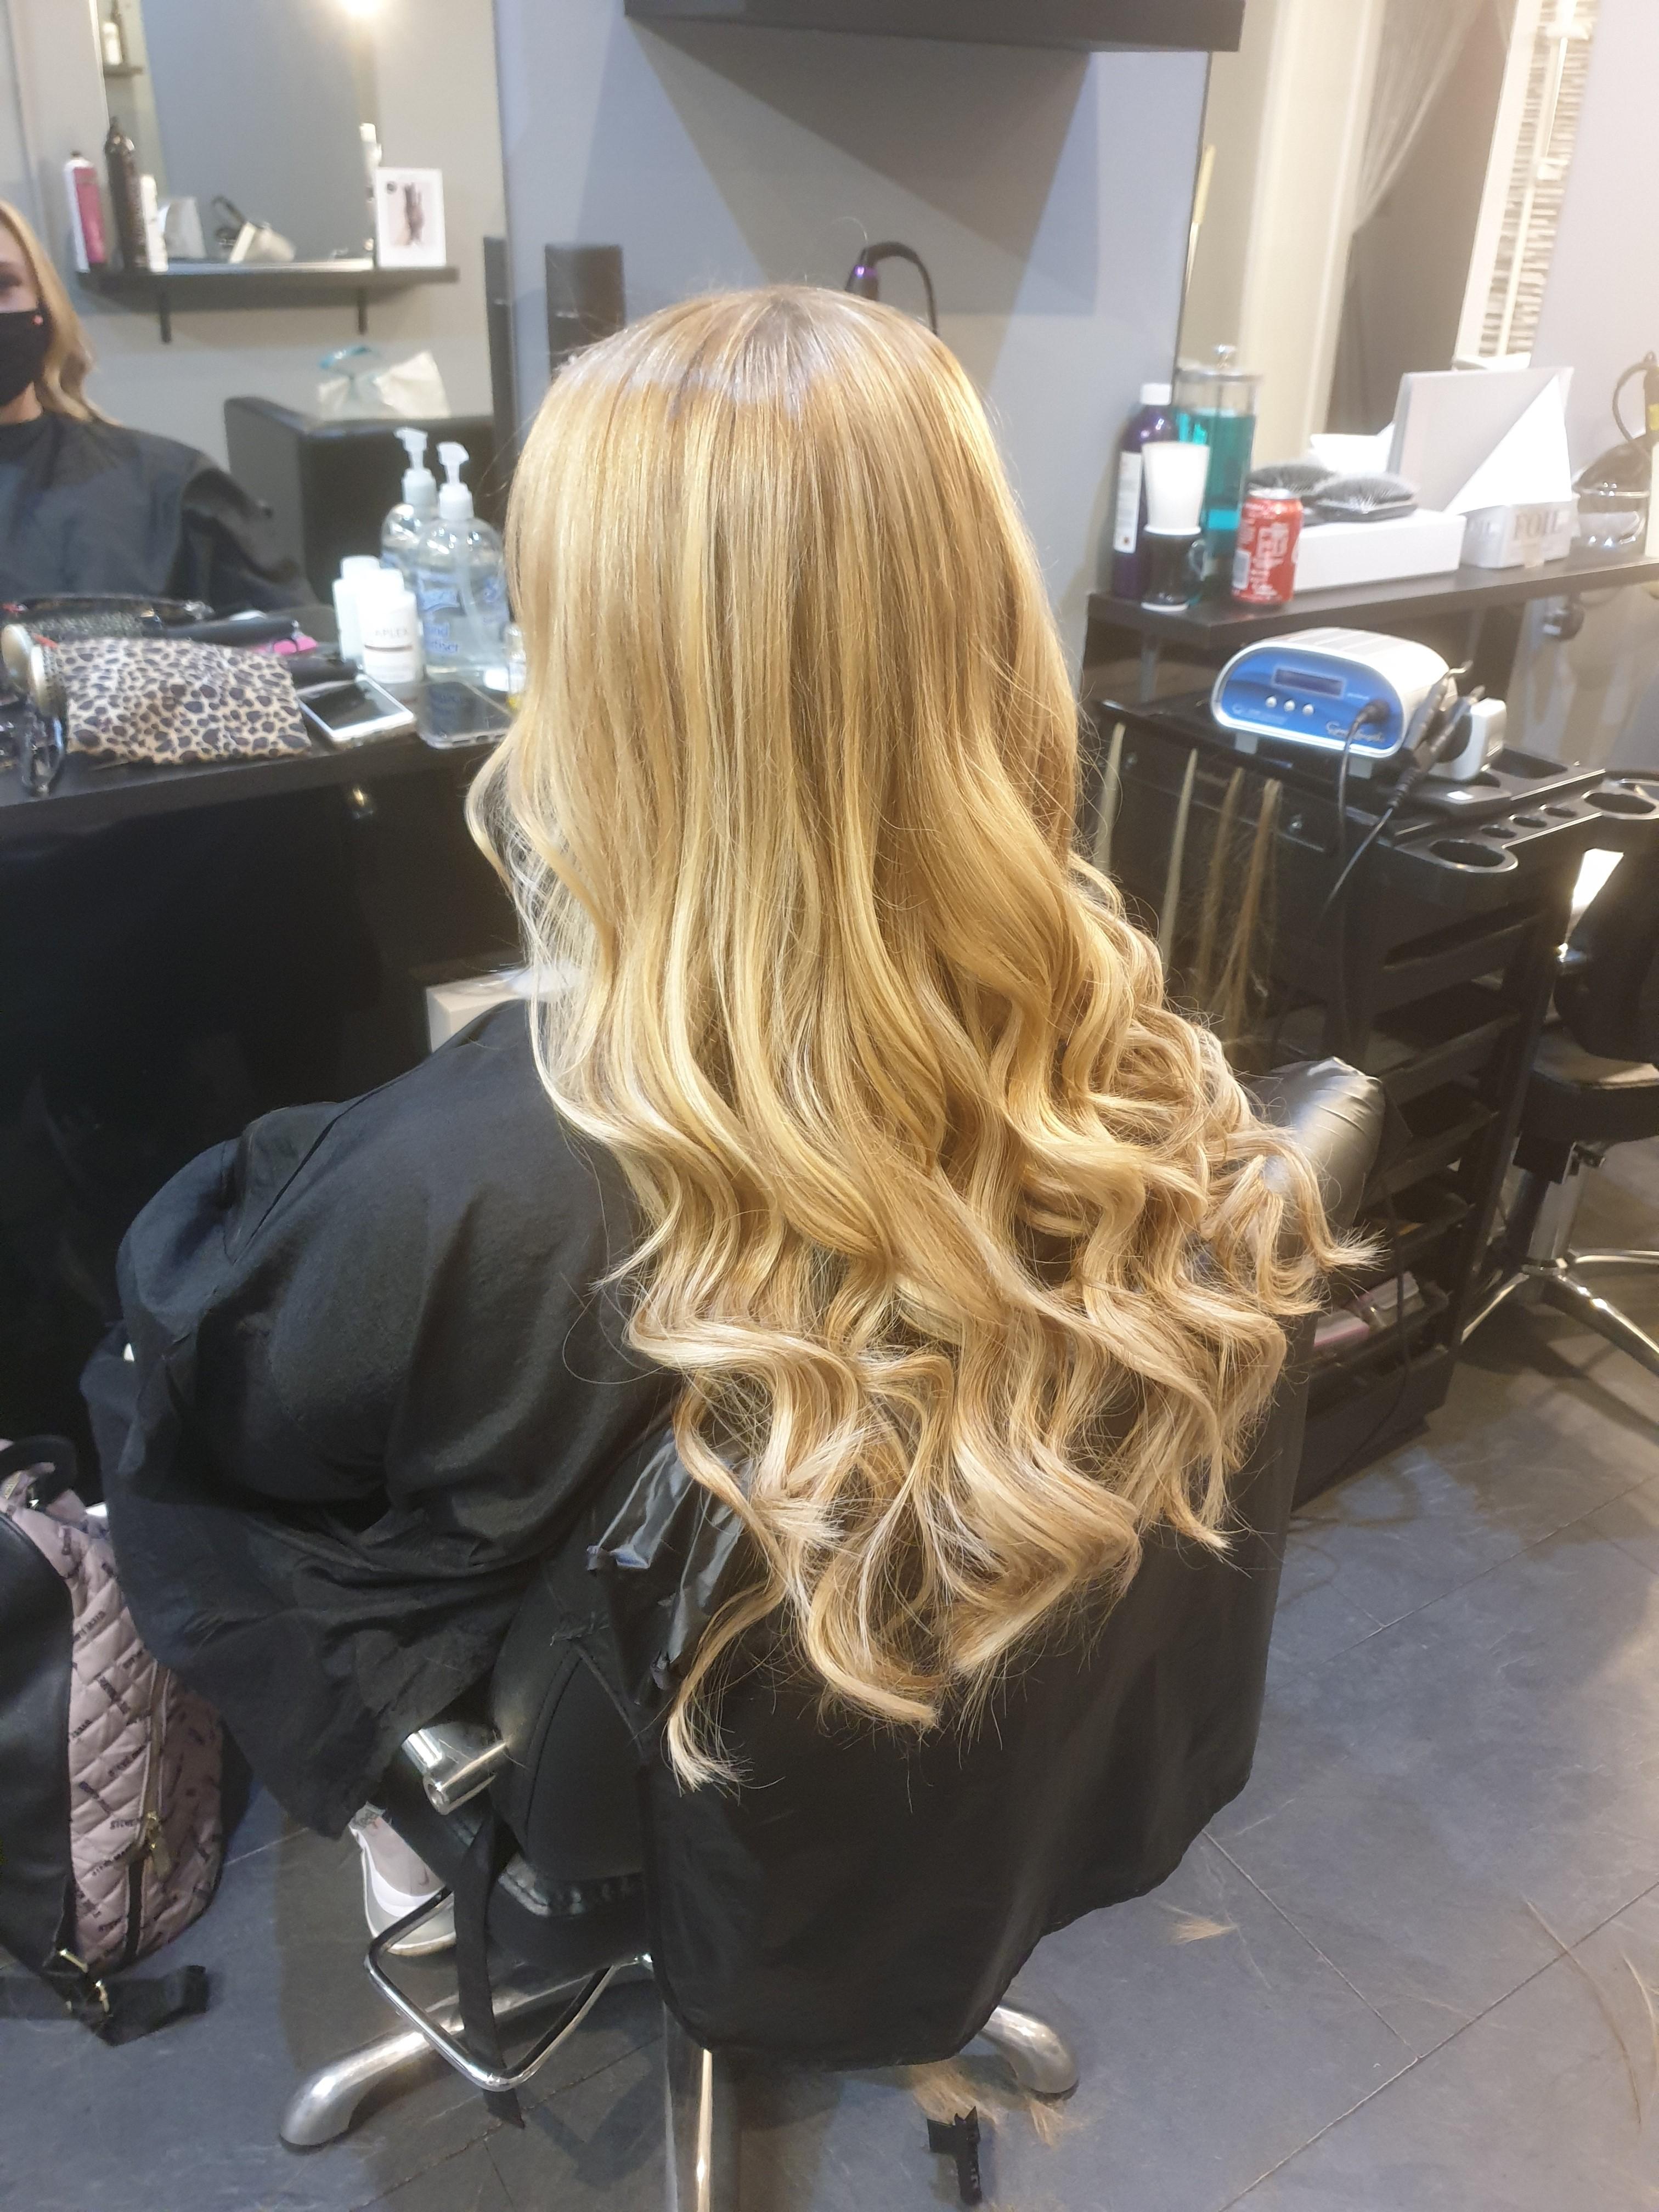 Anne-Marie Ballie at AMB Hair Design (After)